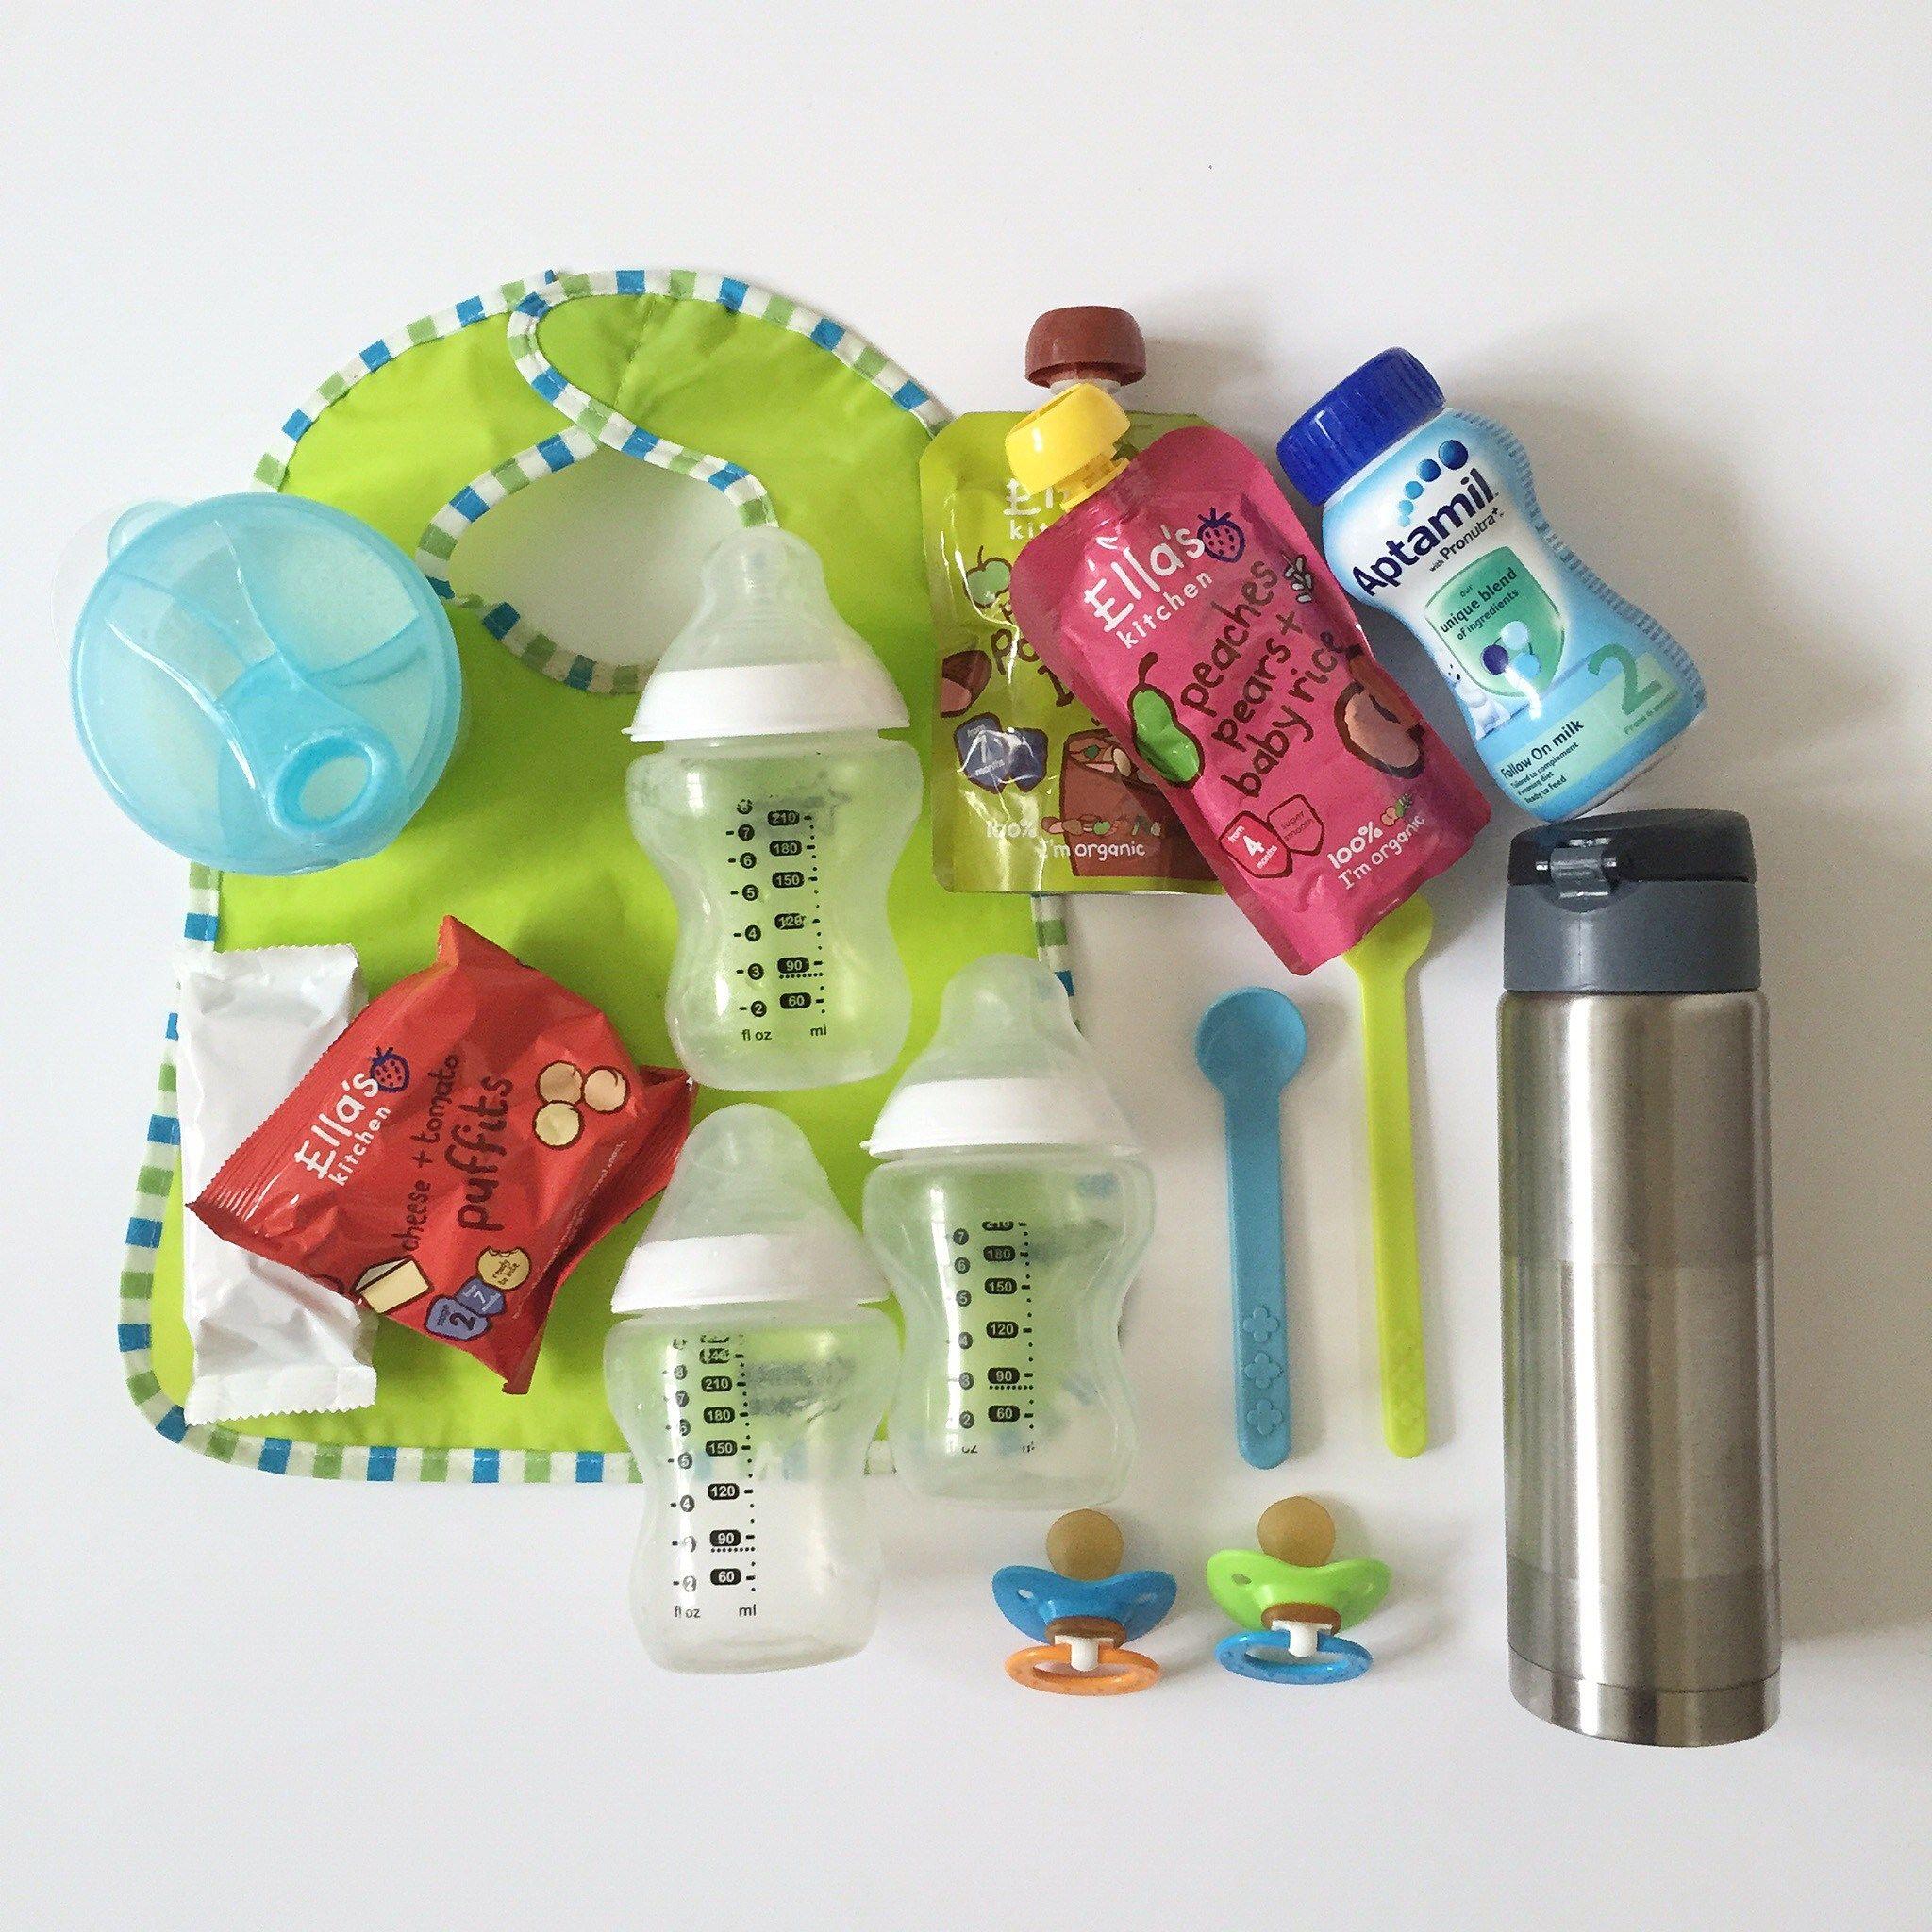 3. Botol minum & alat makan